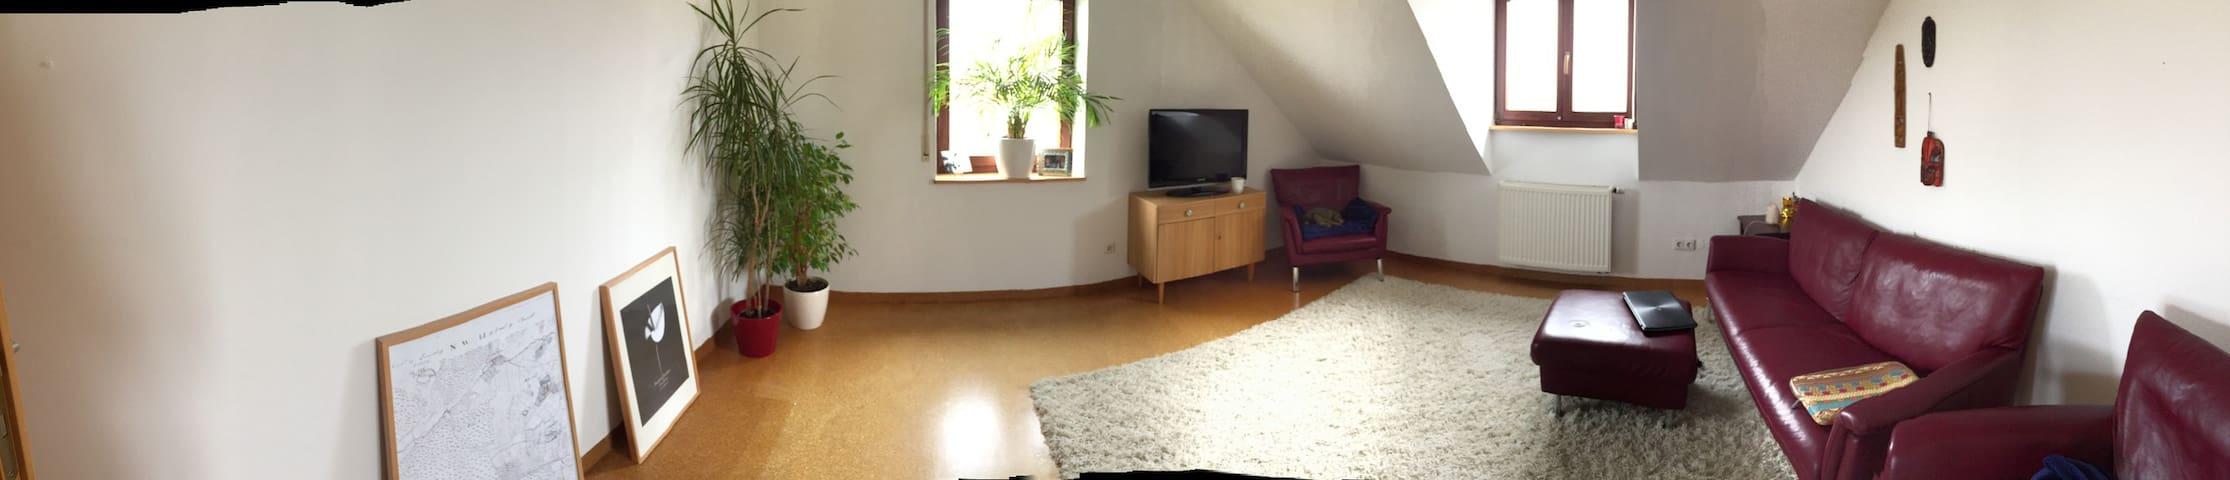 Living in a small village 5 min. from Hilpoltstein - Hilpoltstein - Departamento